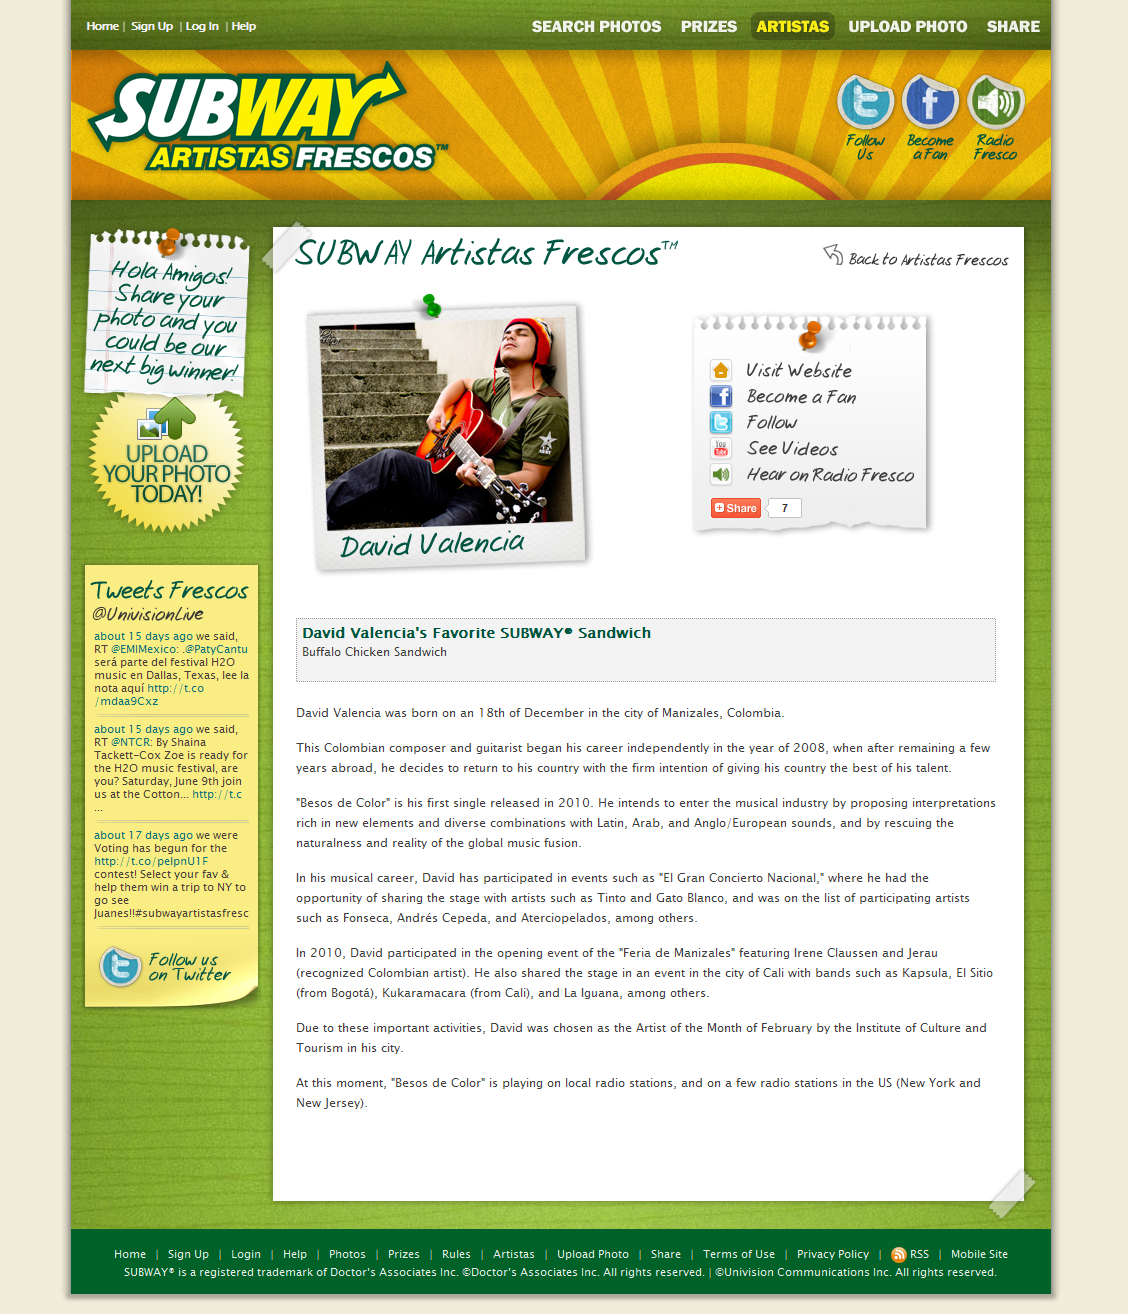 SubwayArtistasFrescos.png